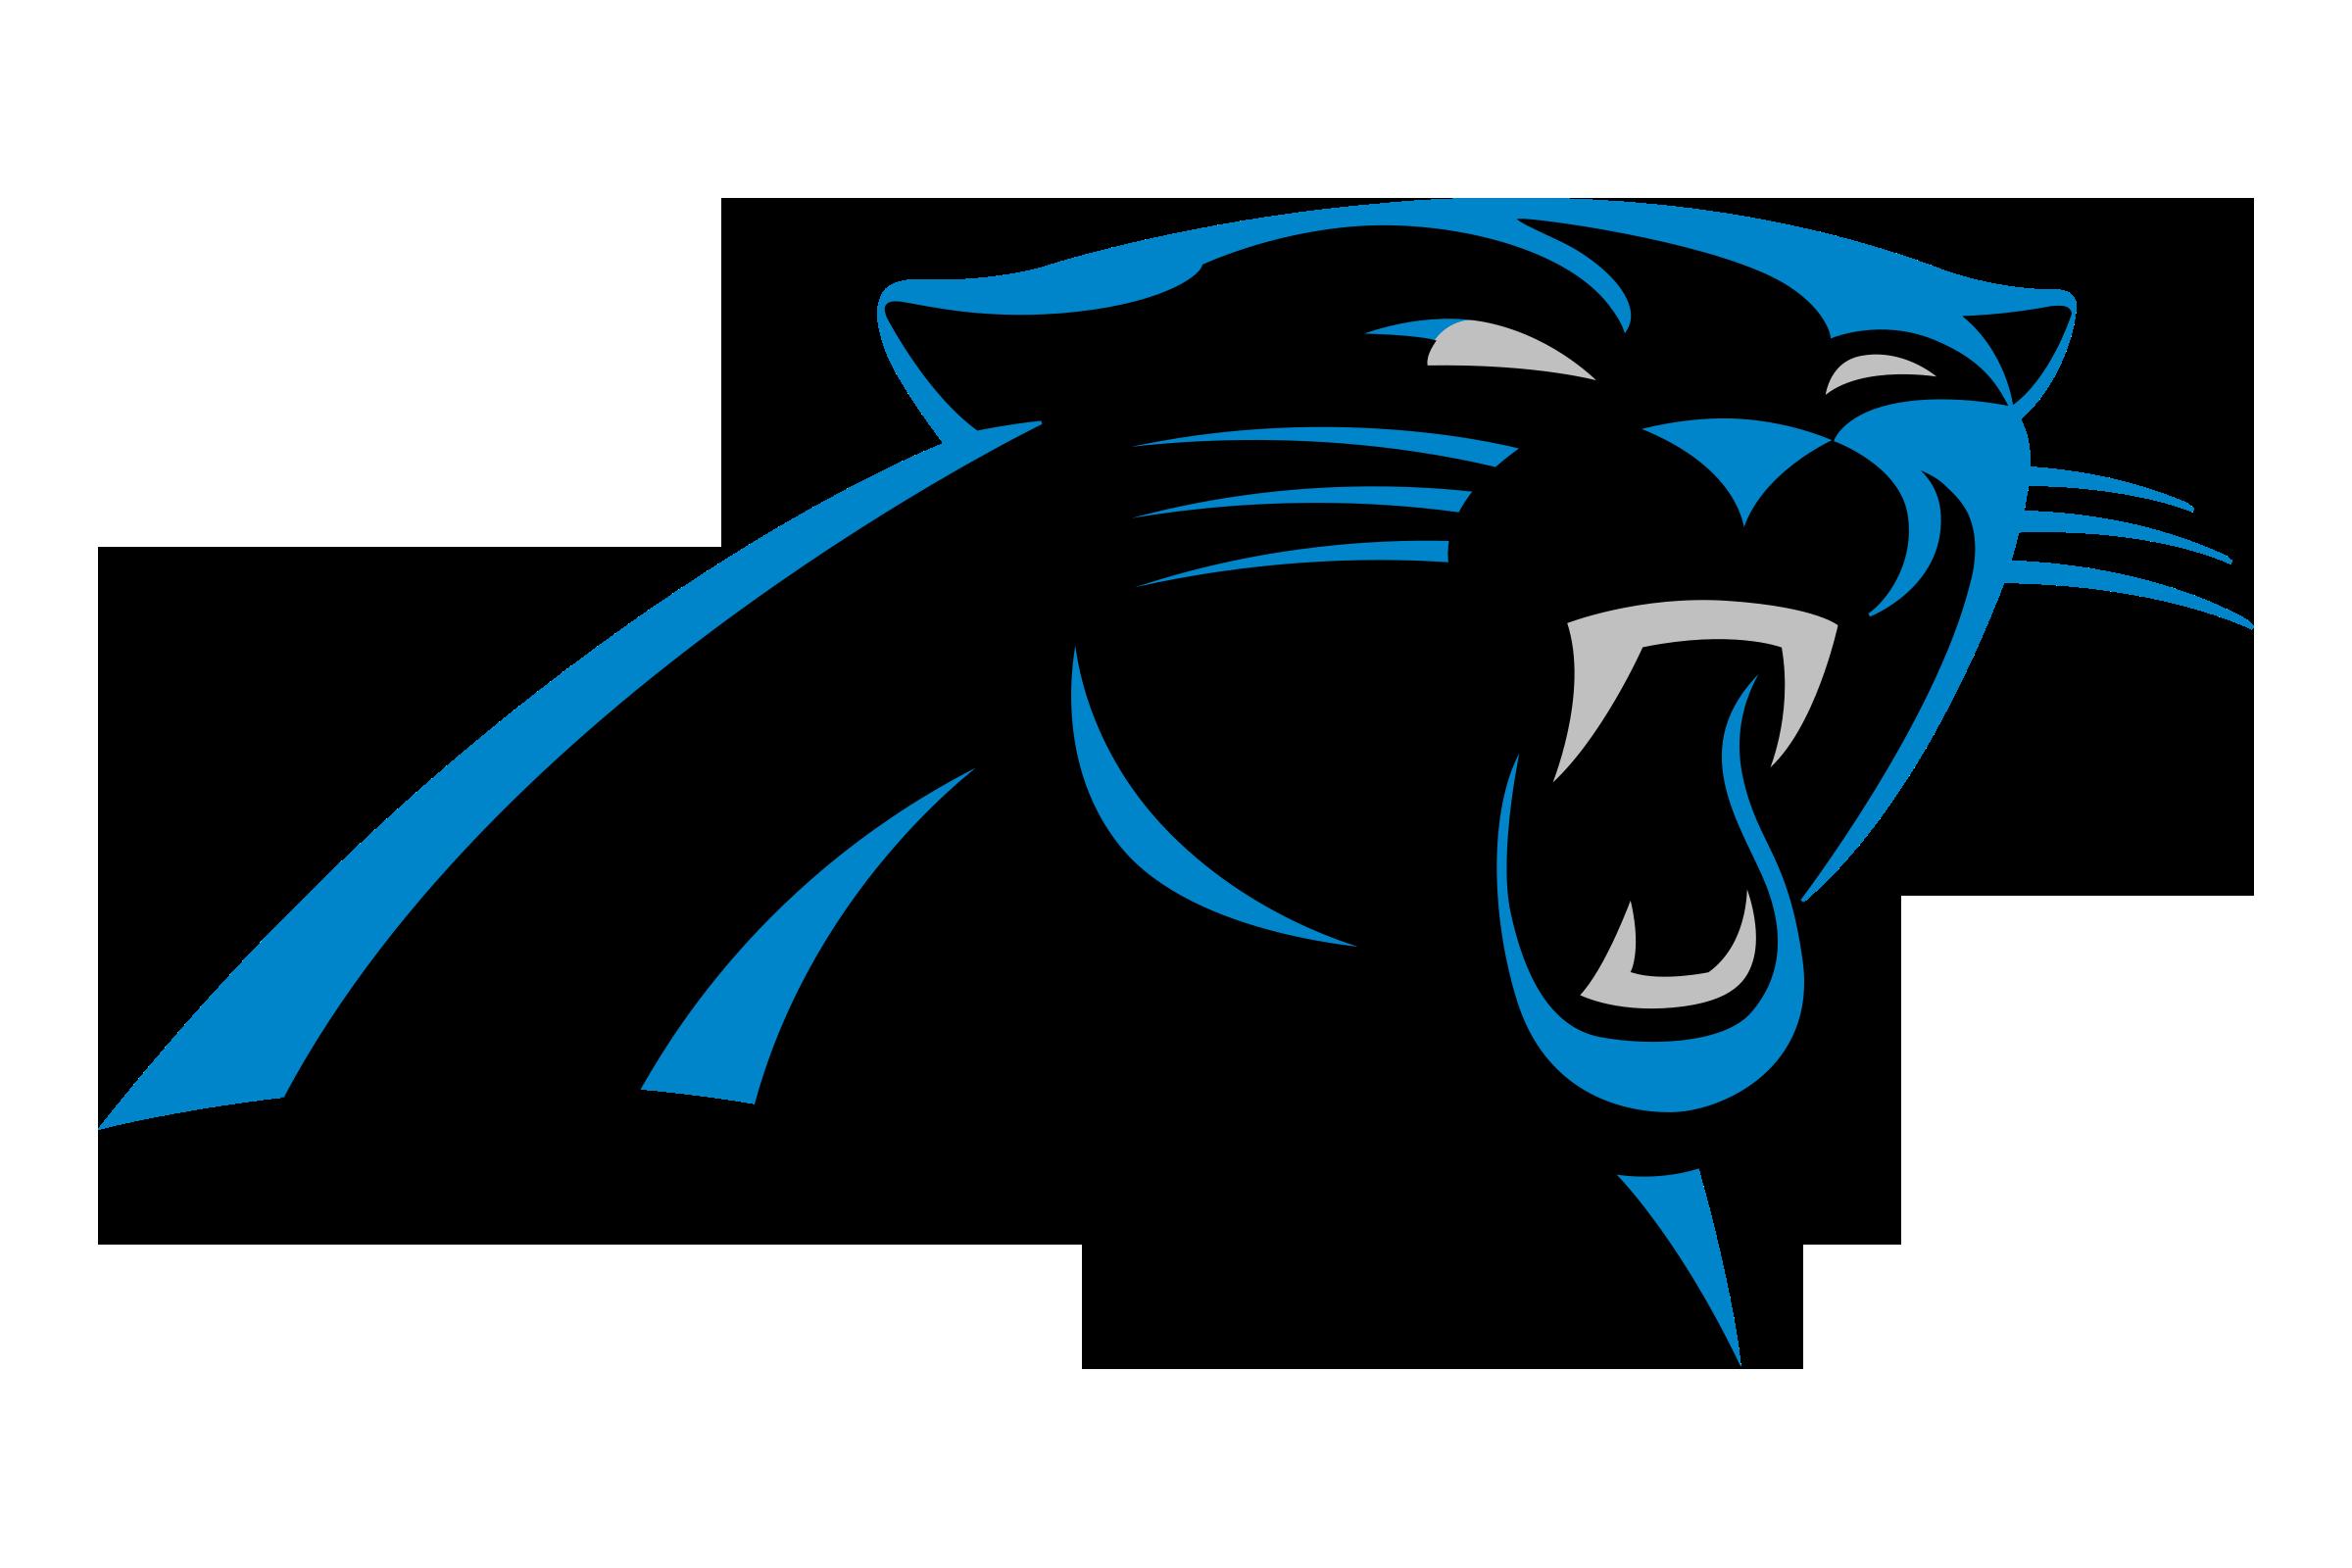 image royalty free download Panthers vector. Carolina logo png transparent